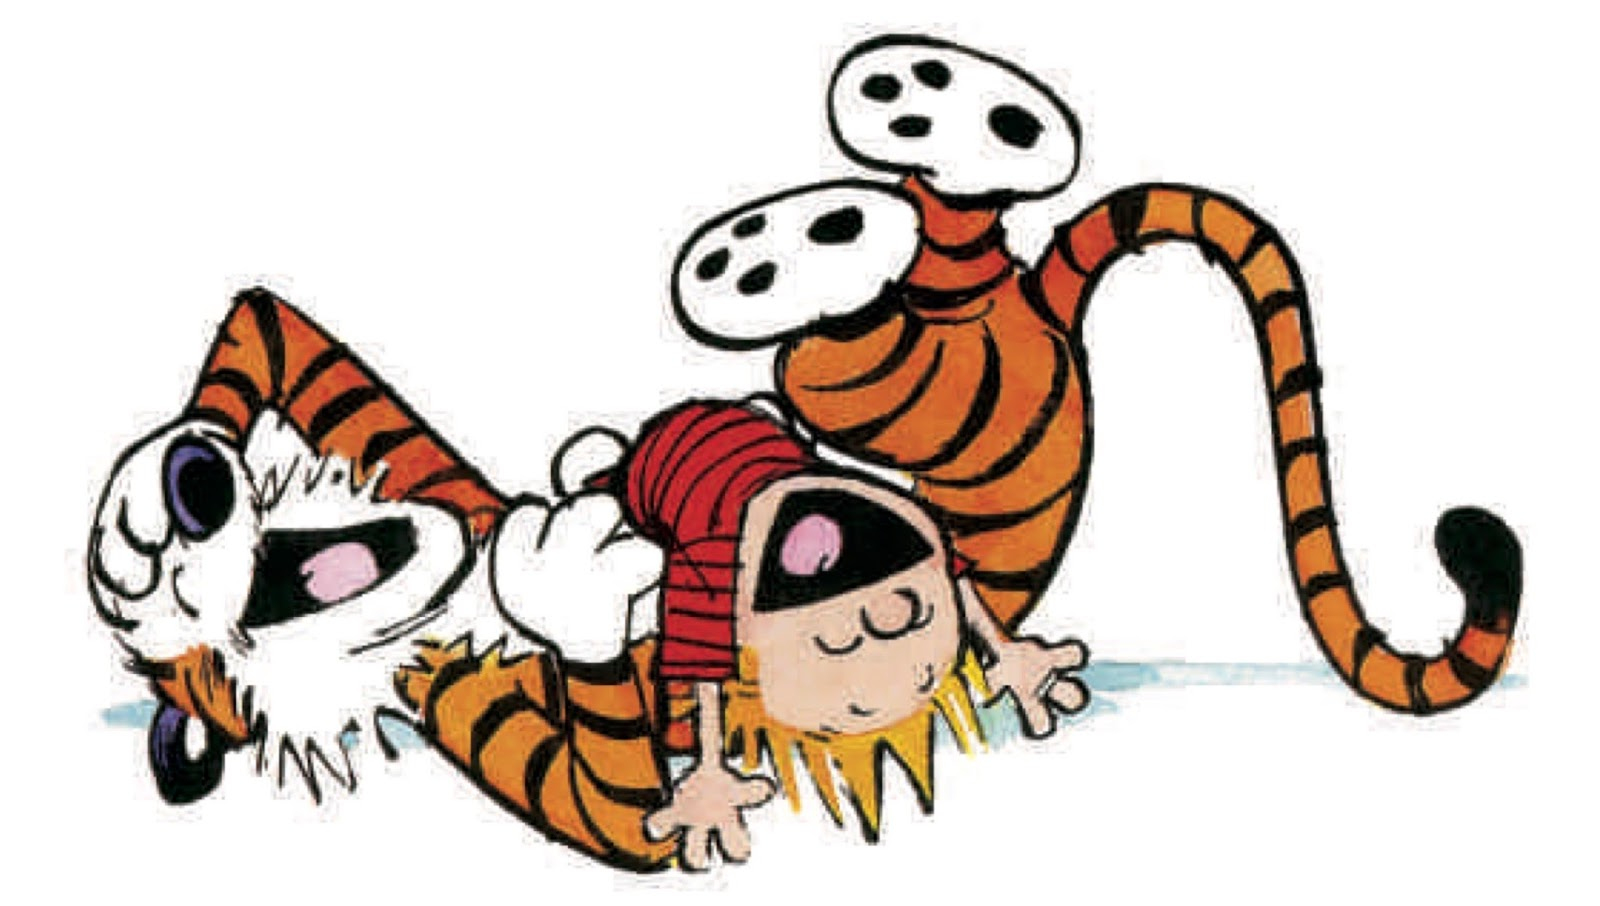 bladbloggno tommy amp tigern tom amp jerry pusur sn216fte